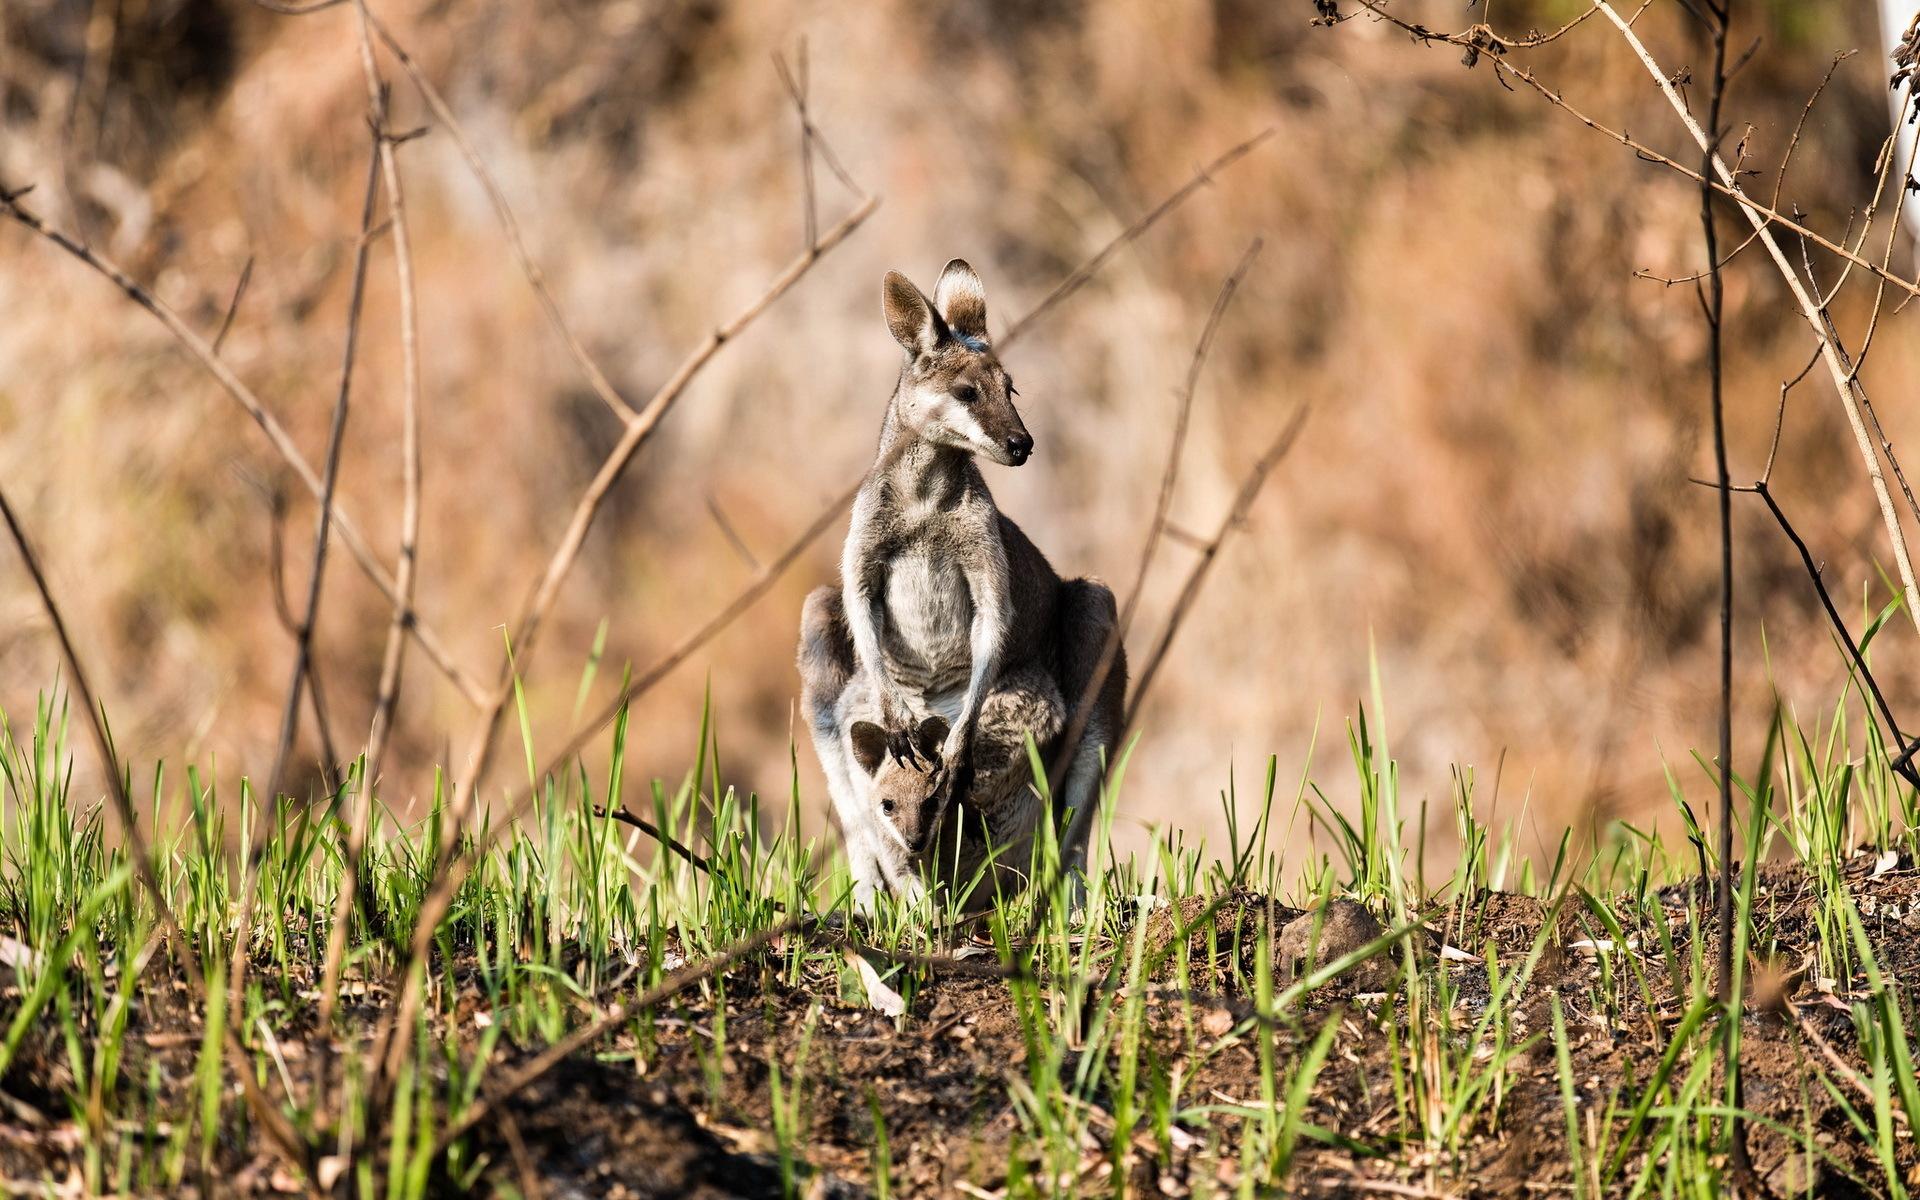 Kangaroo Widescreen